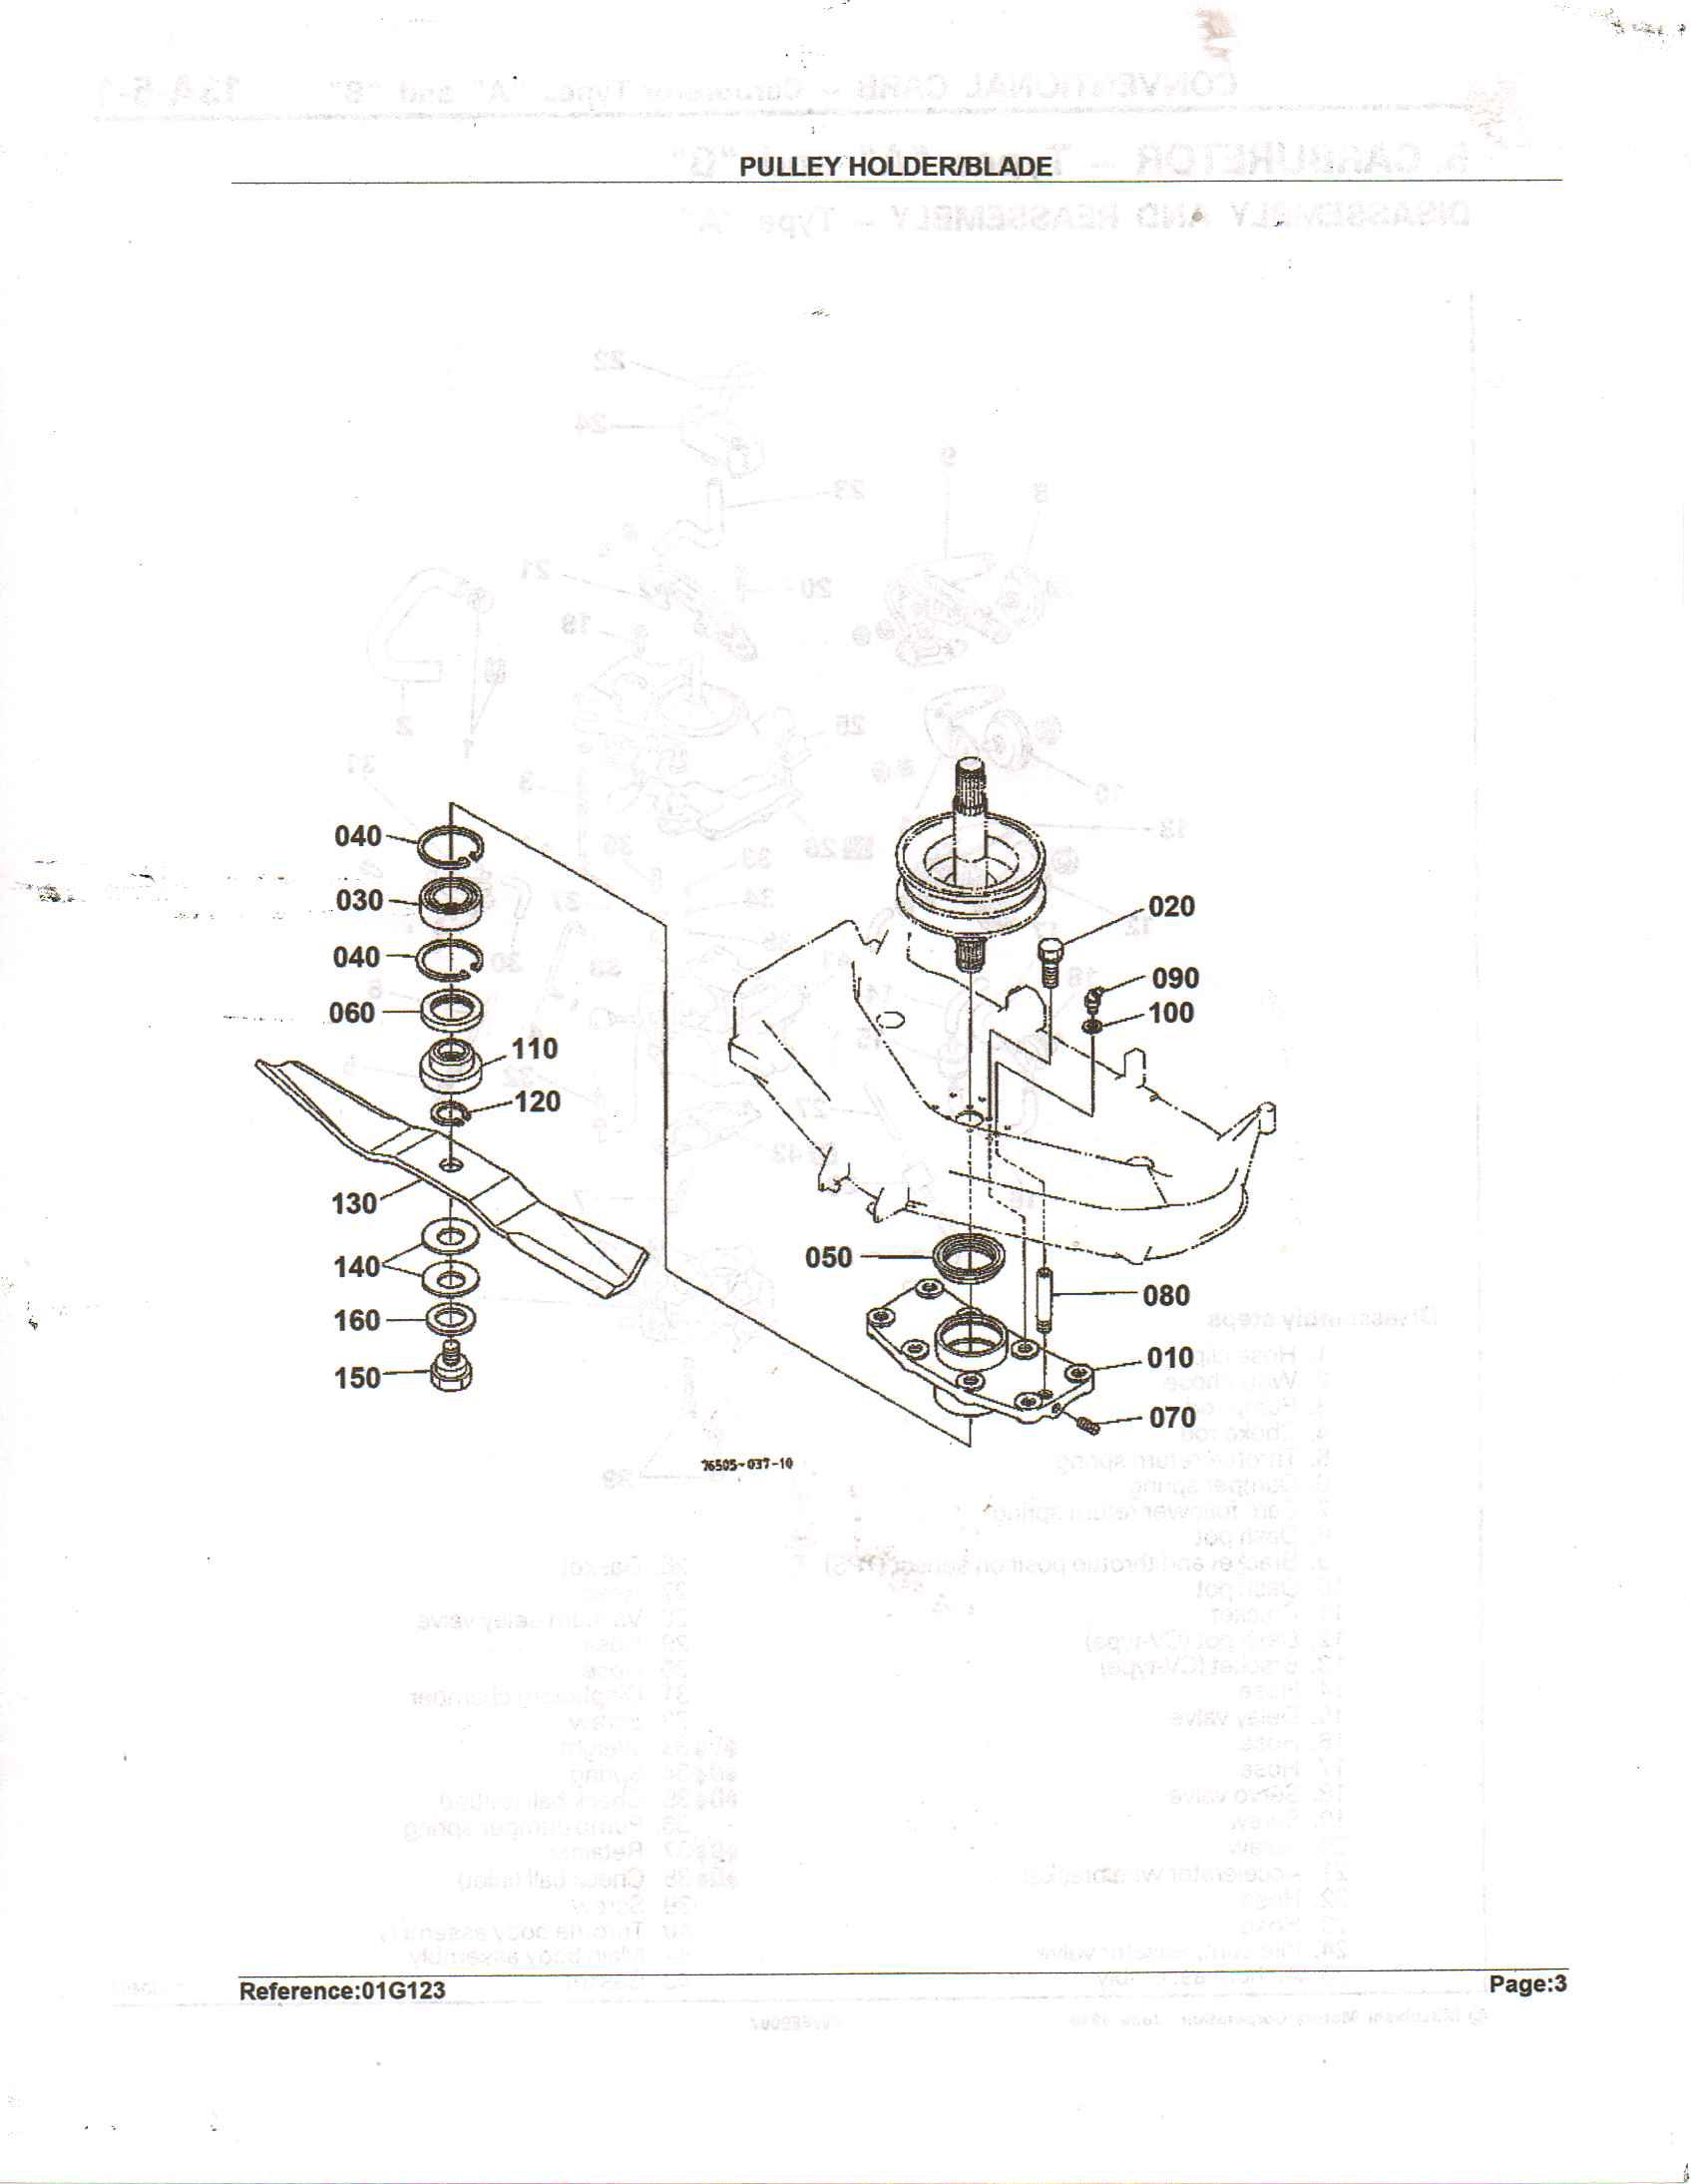 Zd28 kubota engine zd28 tractor engine and wiring diagram dodge ram headlight wiring harness further kubota mower deck parts diagram furthermore b7200 kubota wiring diagram pooptronica Image collections